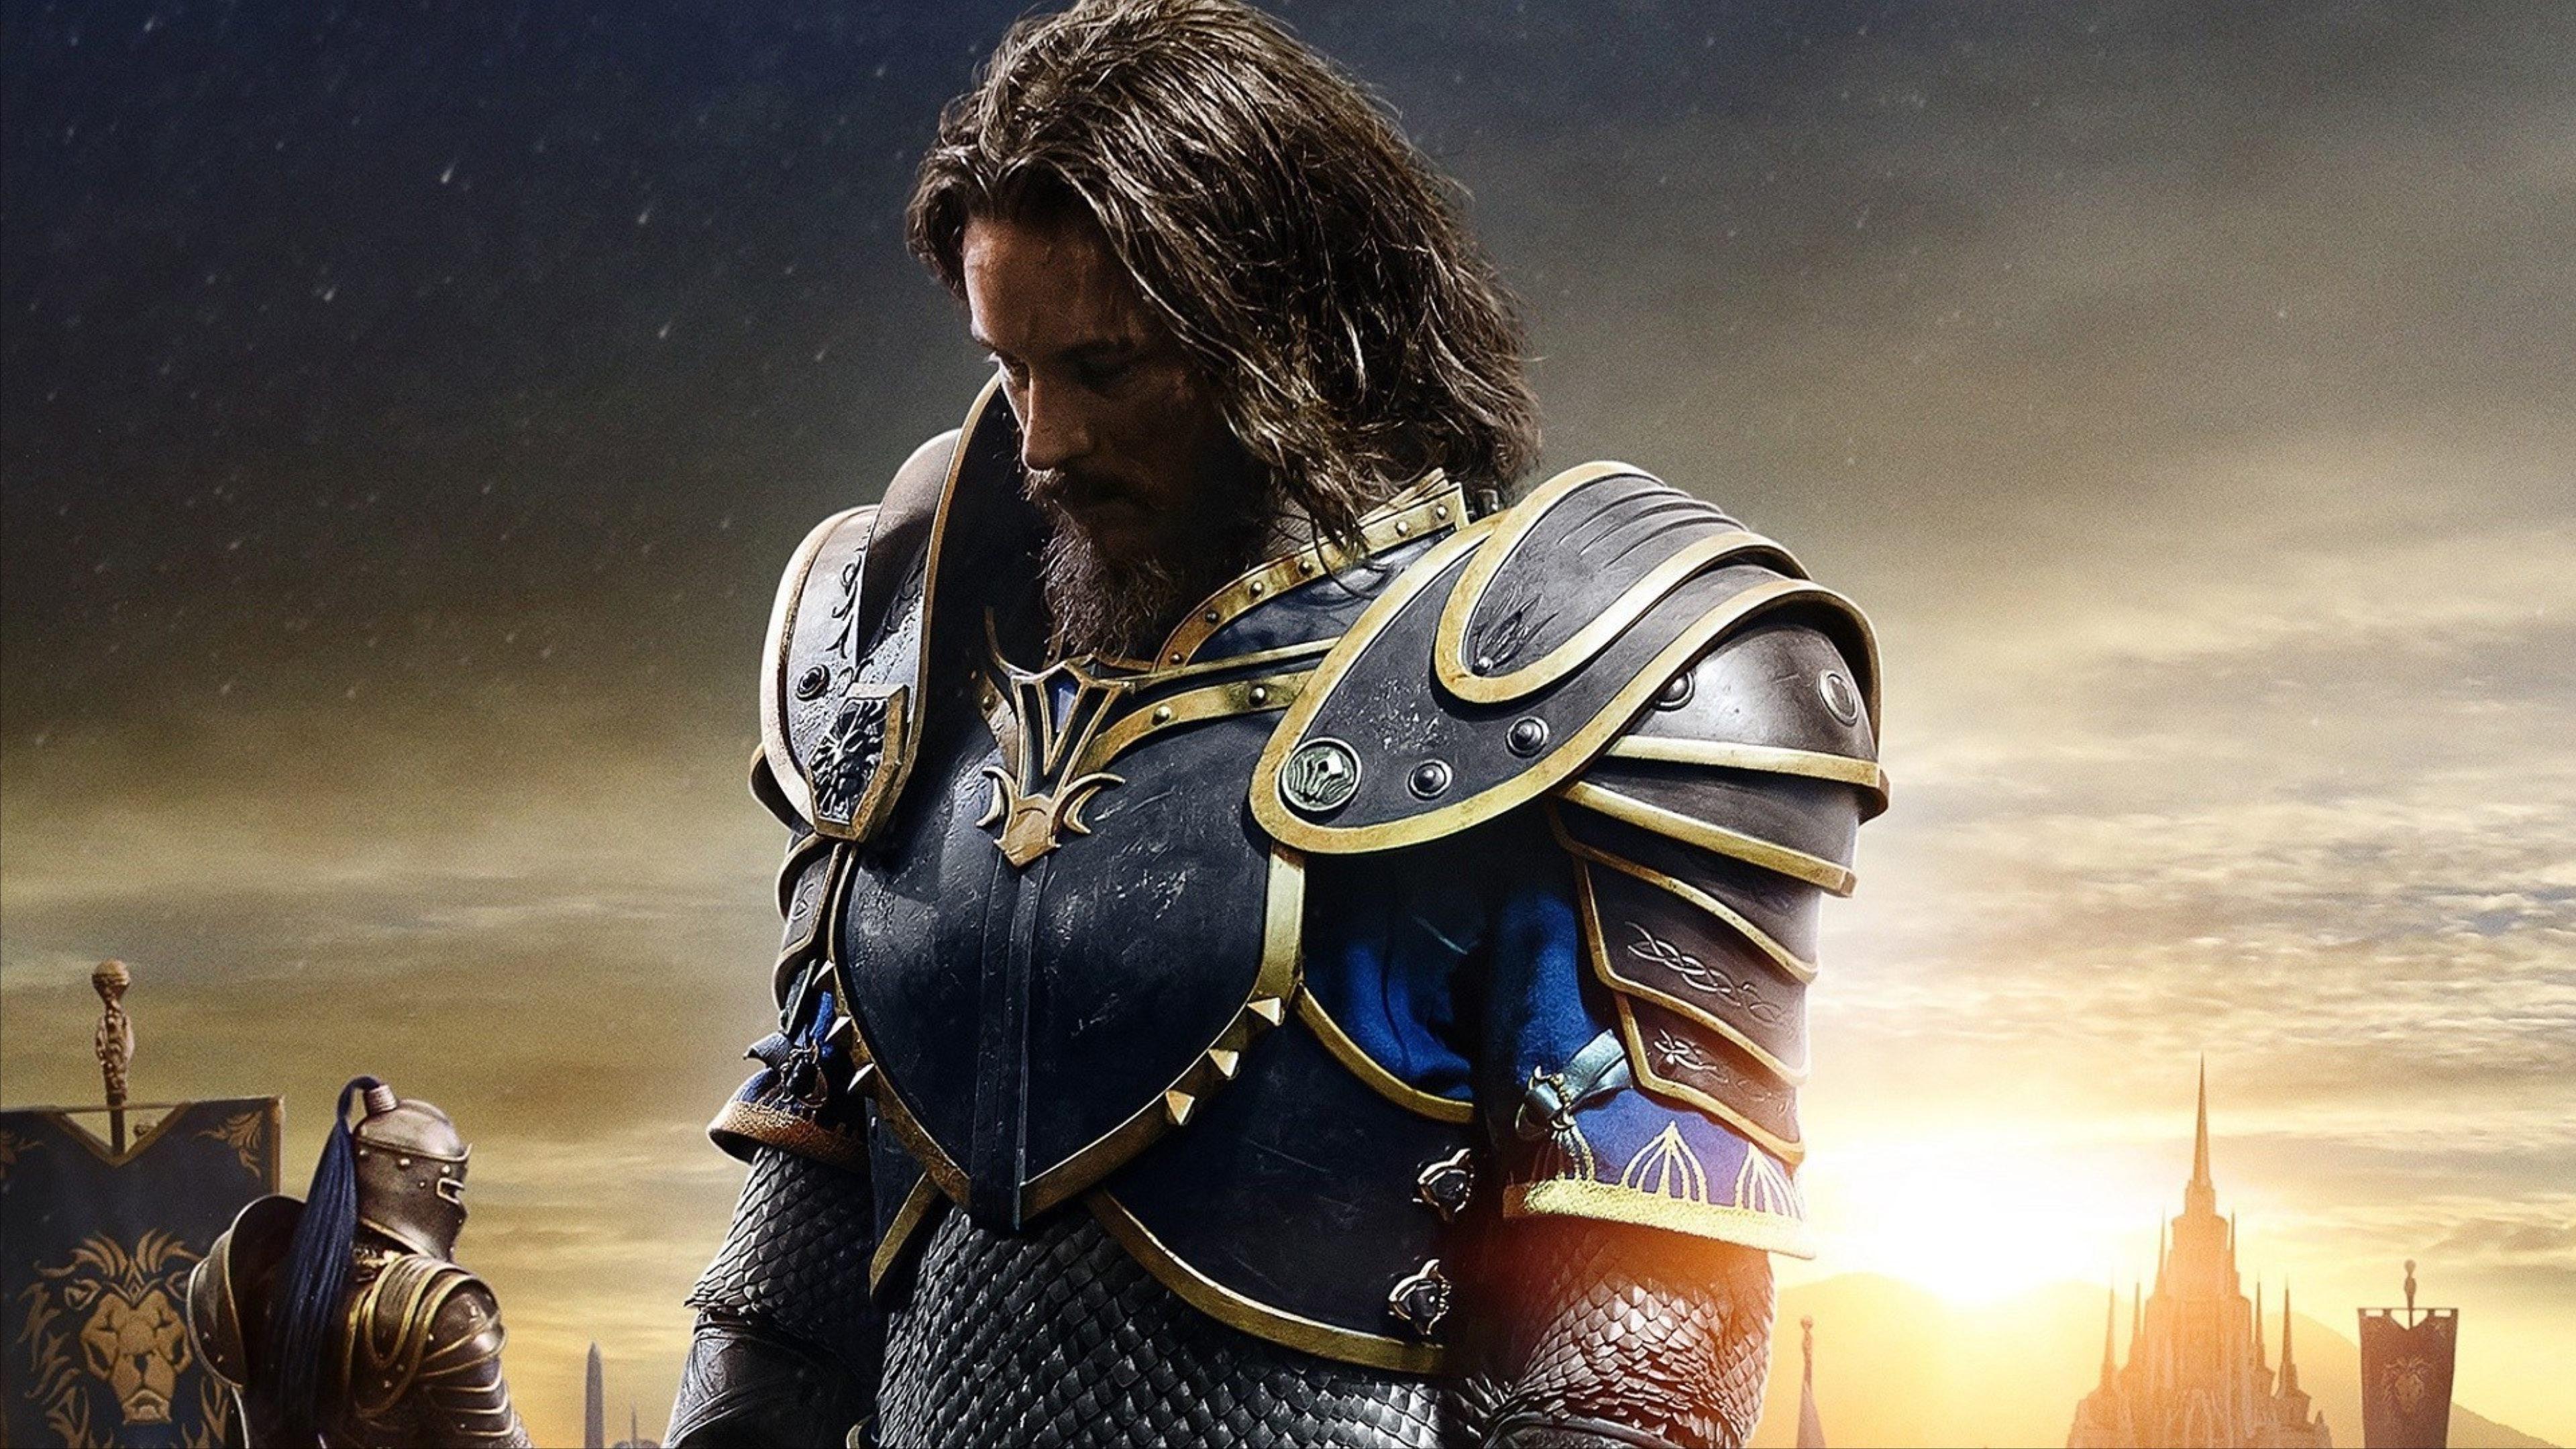 1280x1024 Anduin Lothar In Warcraft Movie 1280x1024